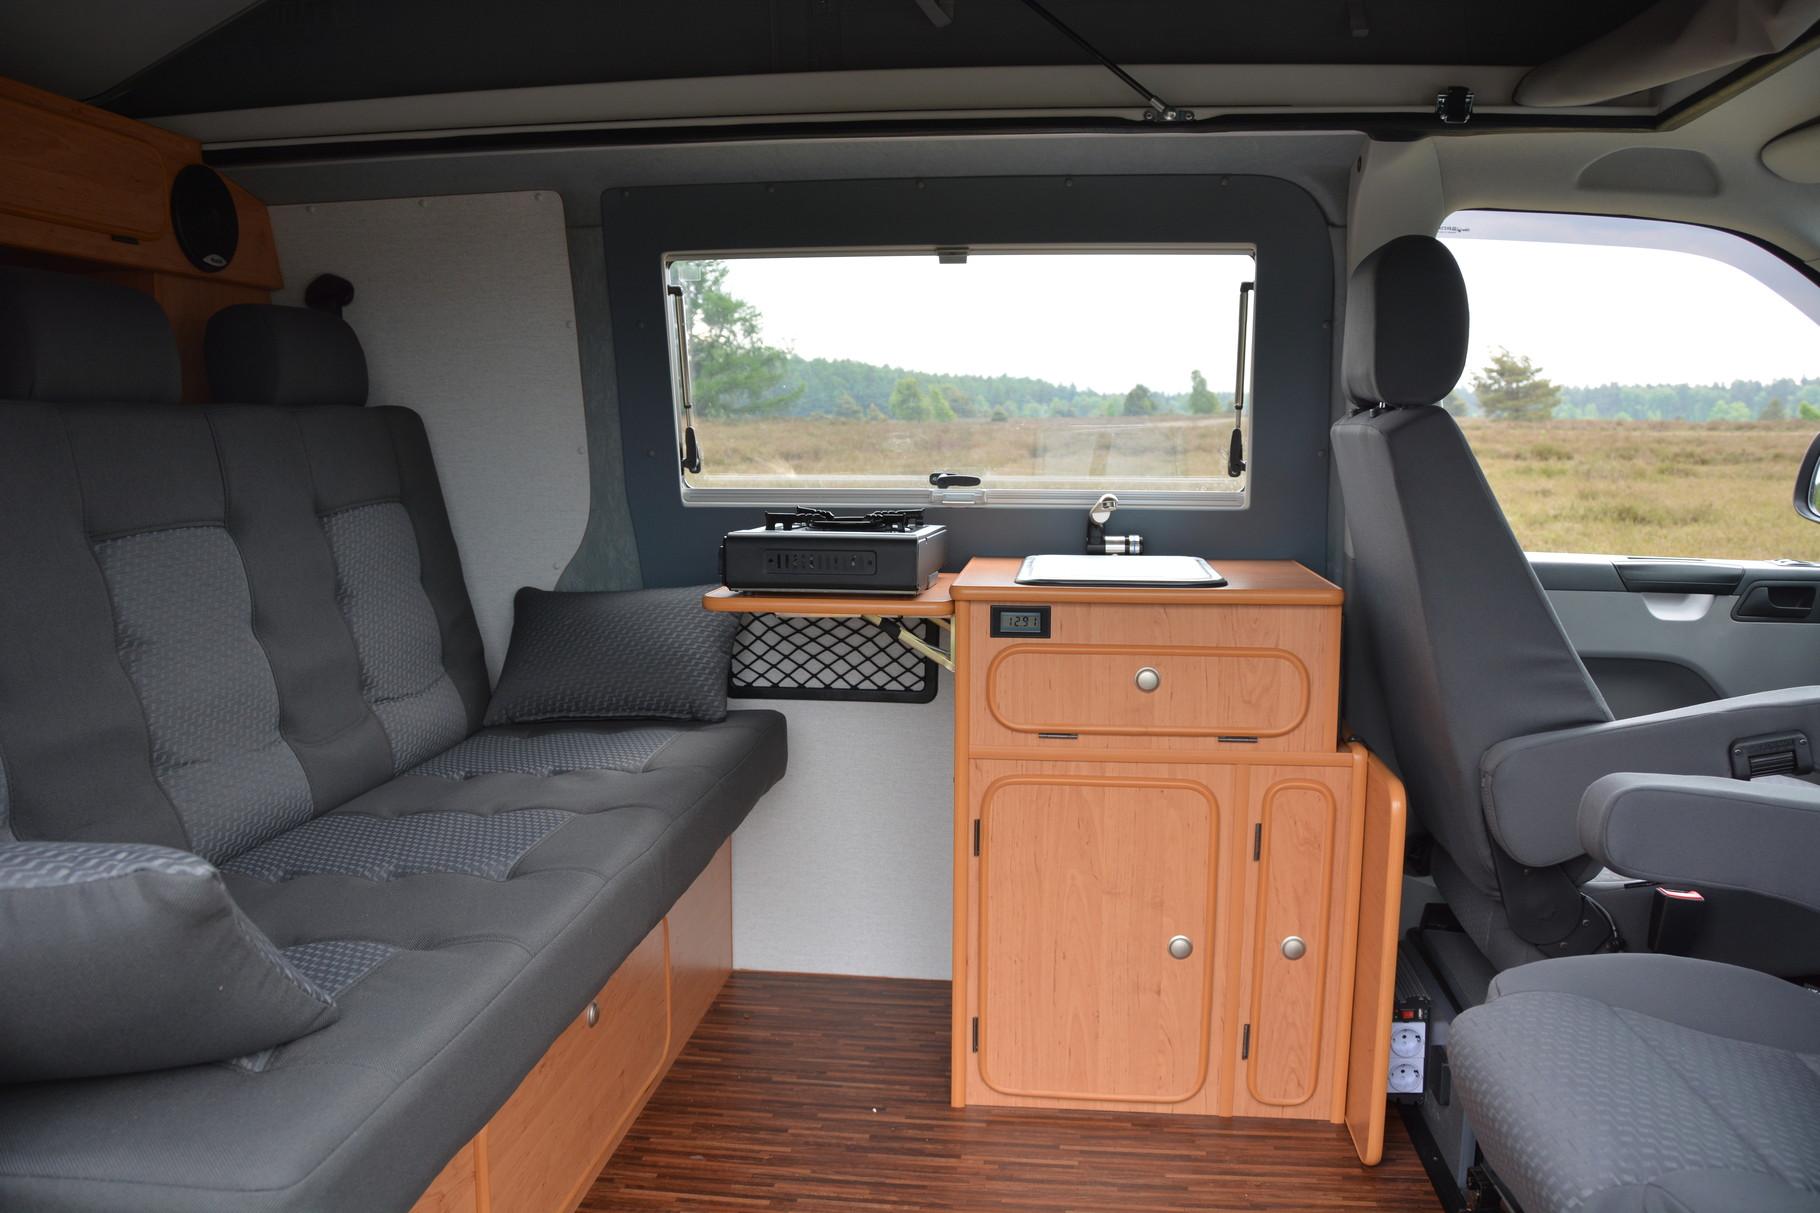 wohnmobil k chenblock selber bauen hochschr nke k che. Black Bedroom Furniture Sets. Home Design Ideas